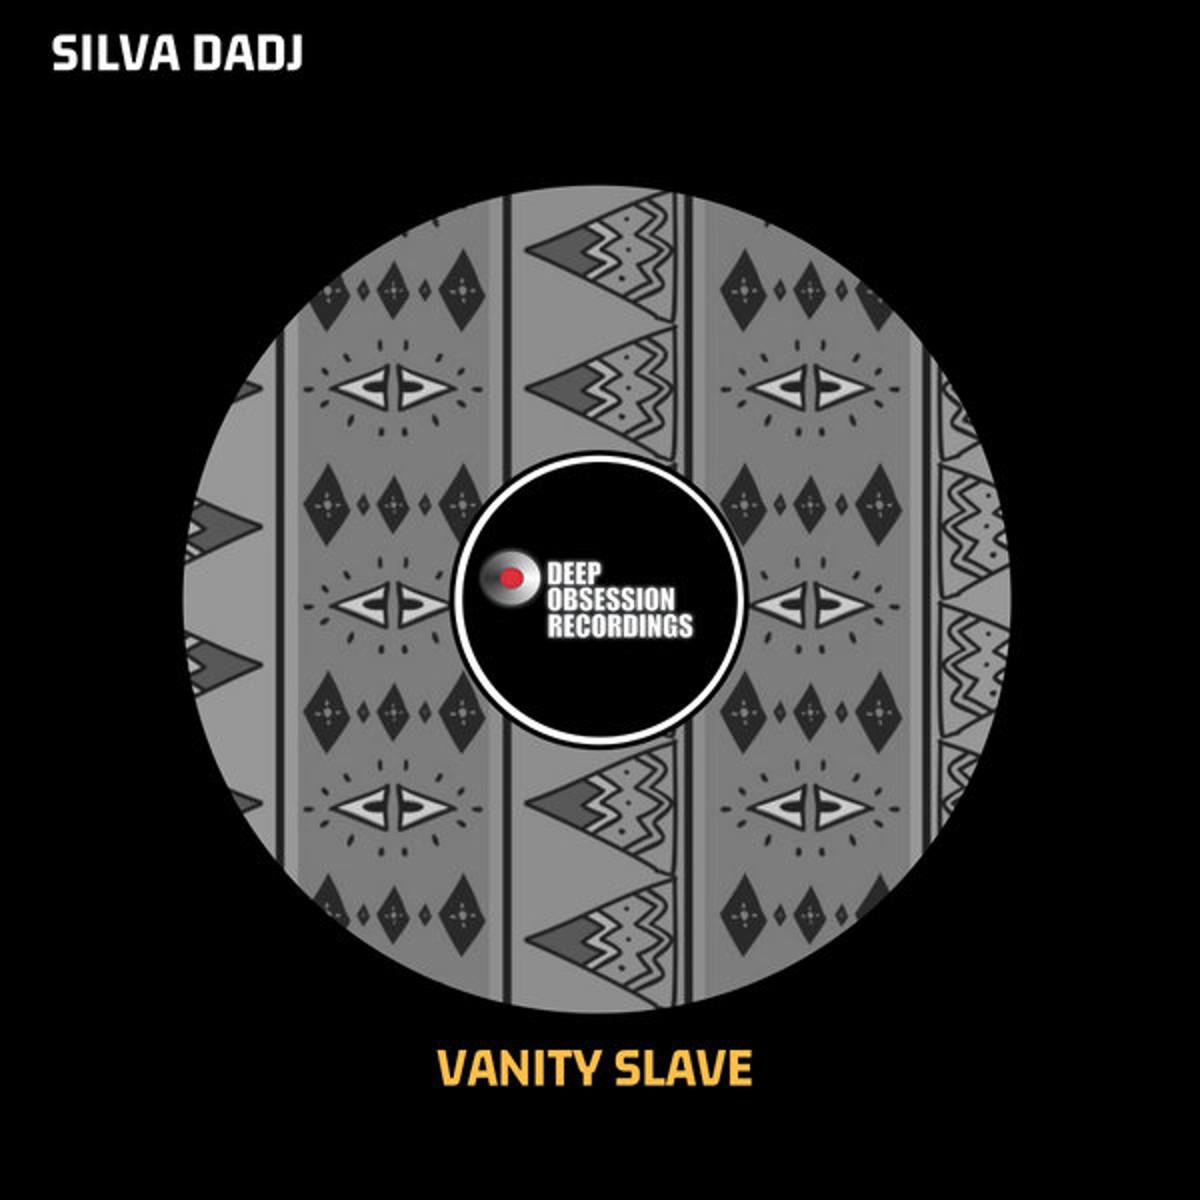 Silva DaDj Vanity Slave - Silva DaDj – Vanity Slave